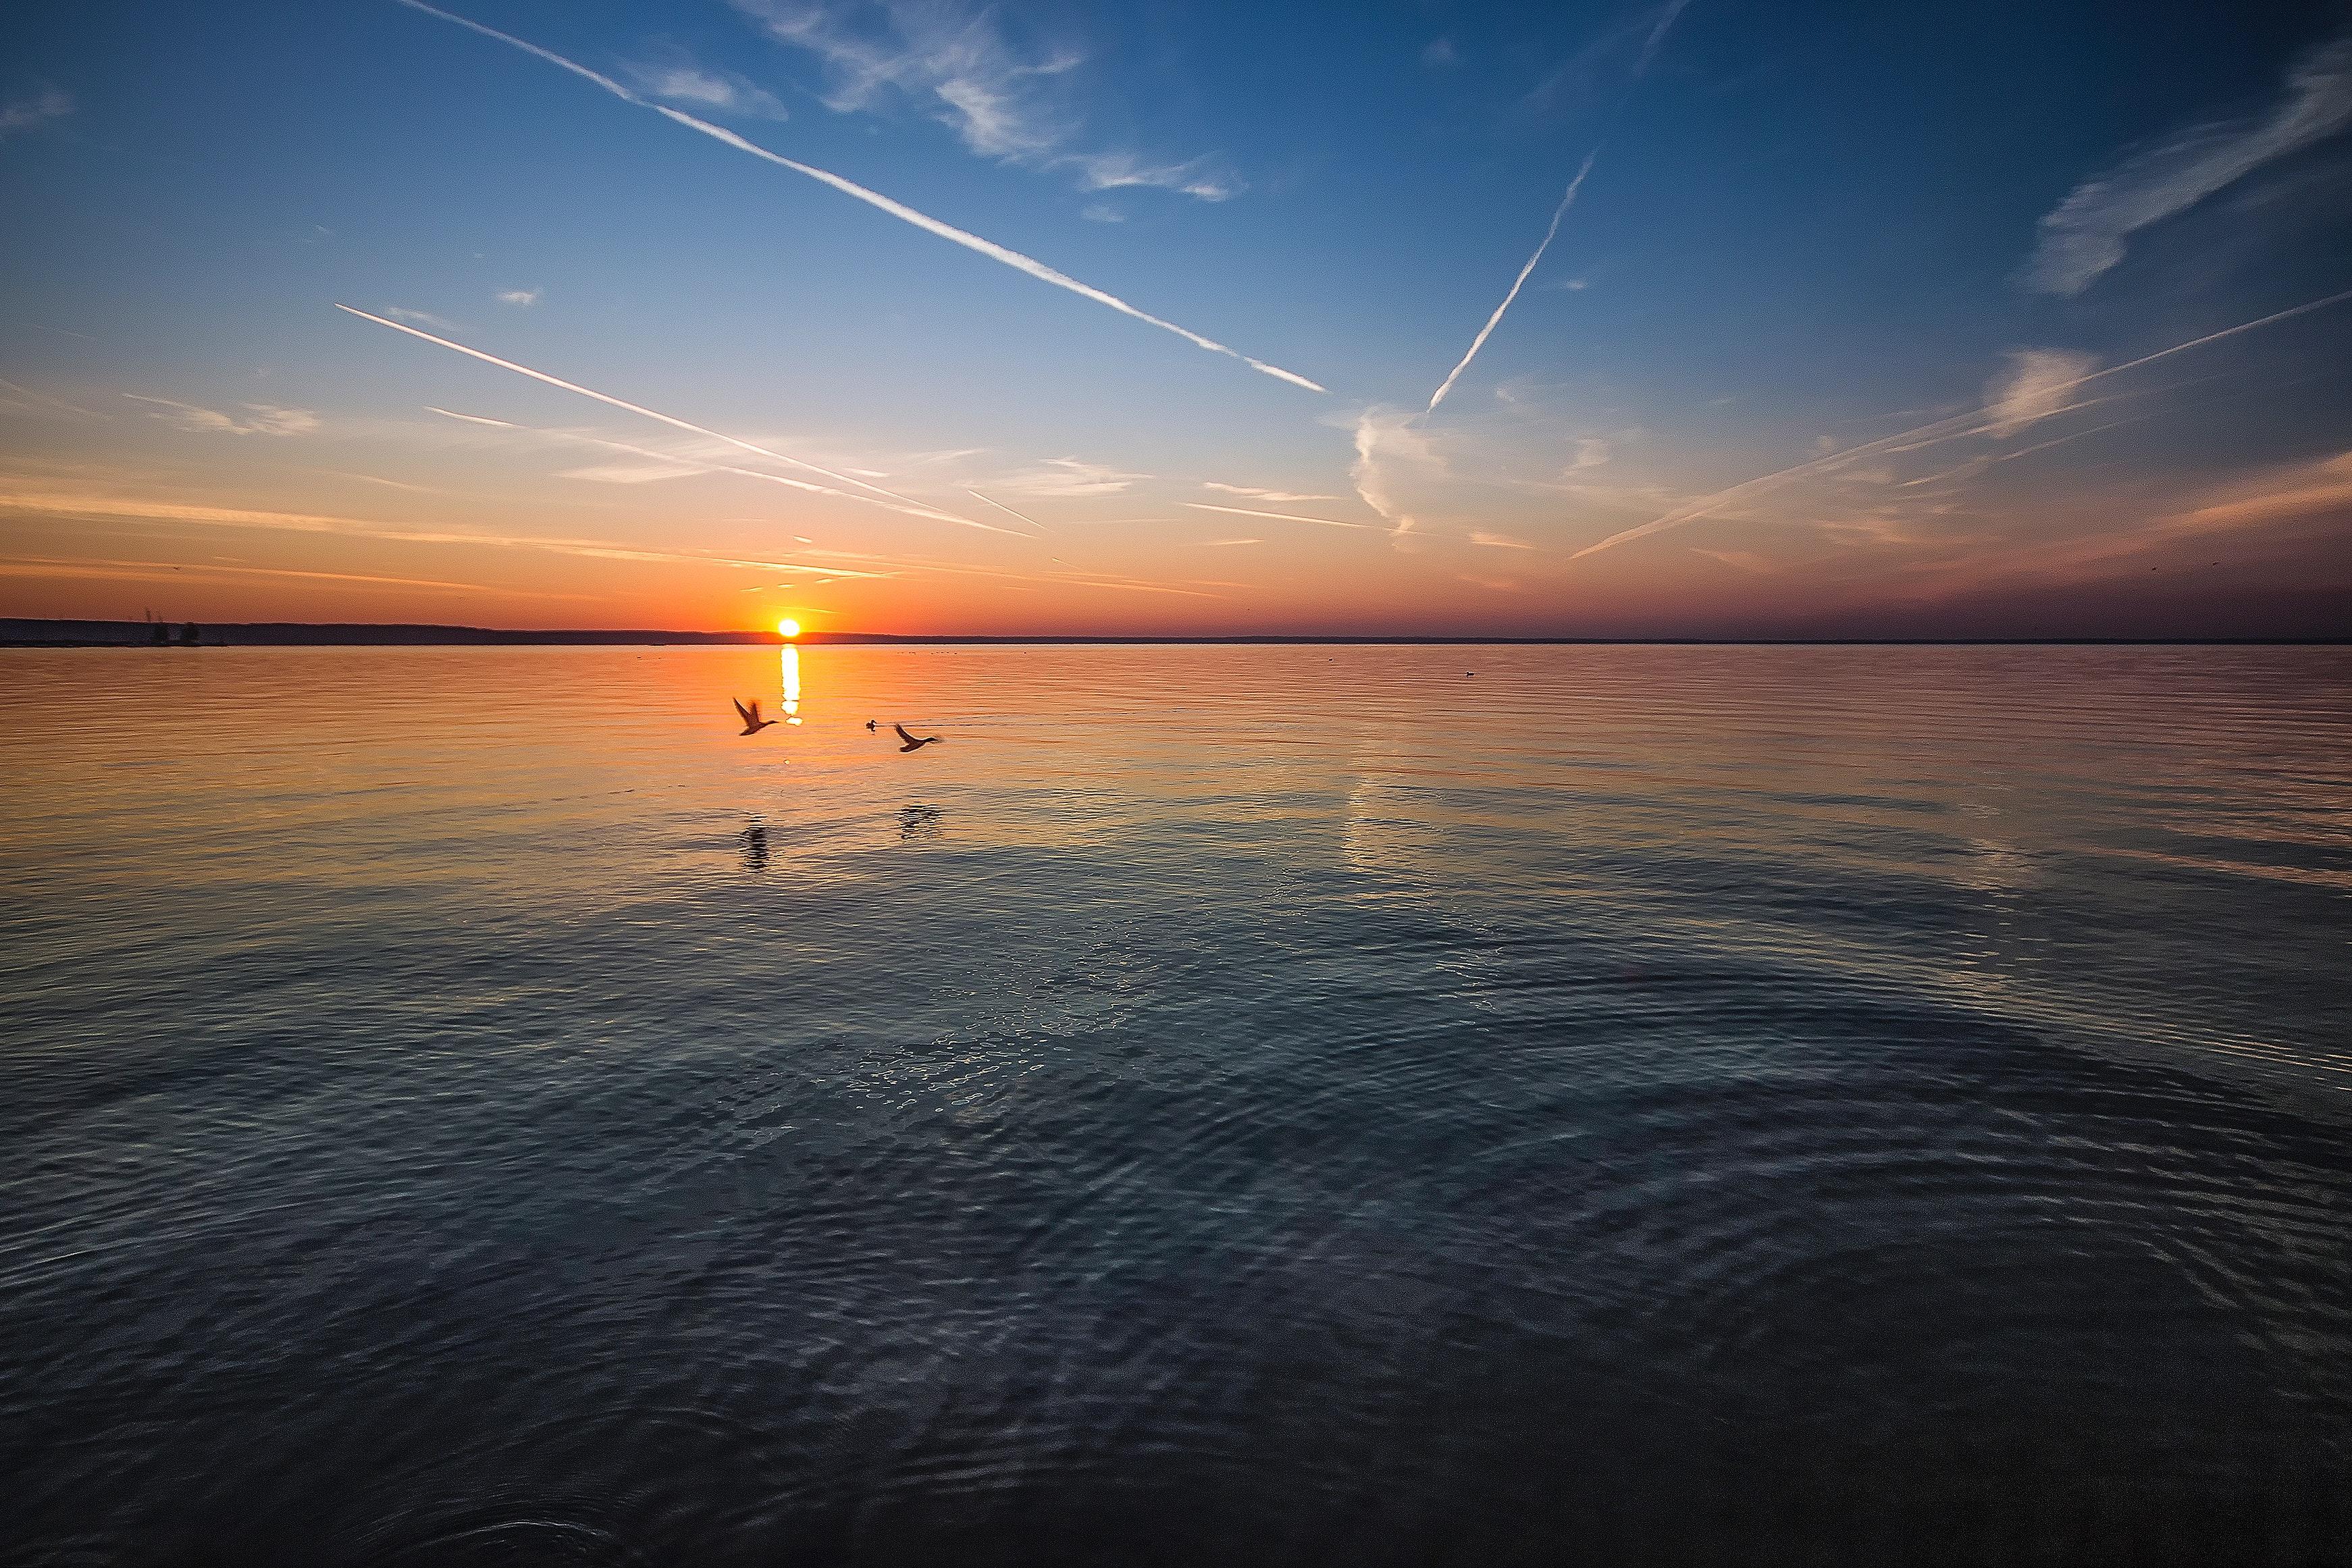 2 birds flying near body of water during orange sunset photo